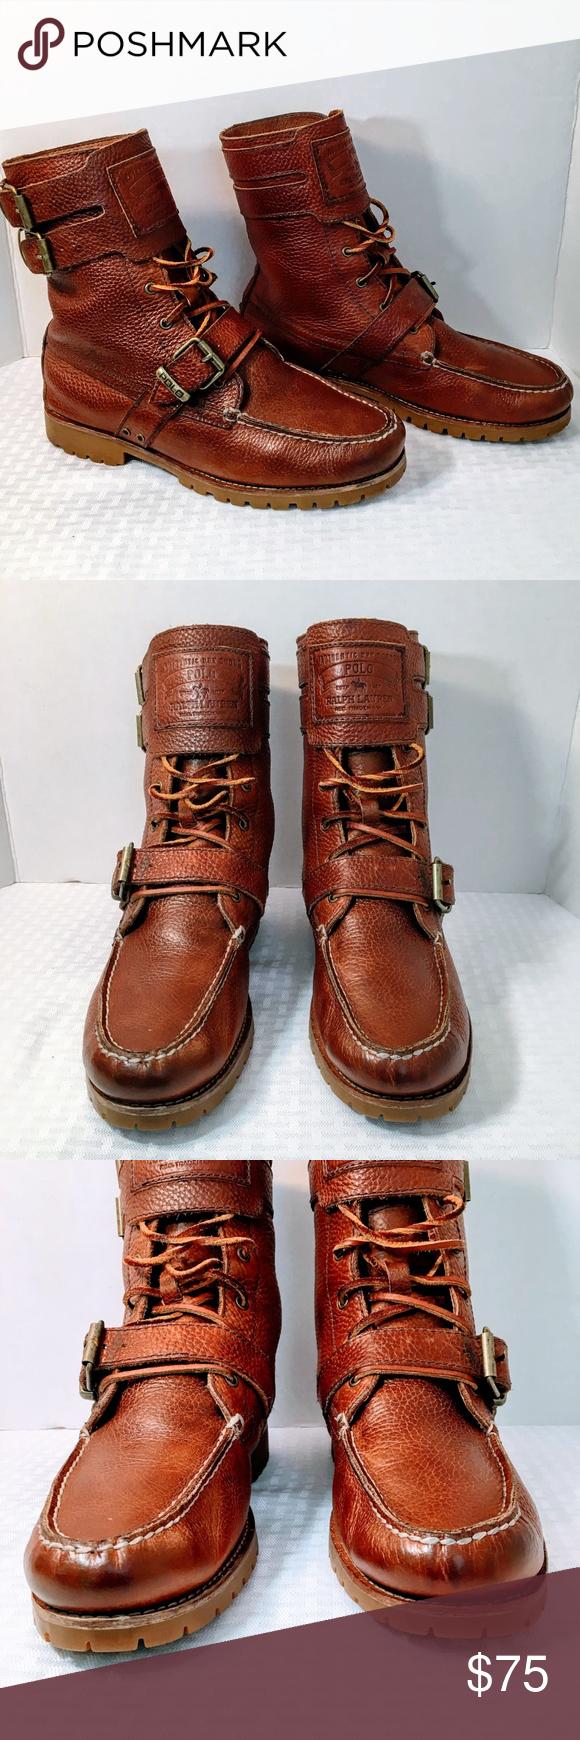 Buckle boots, Boots, Ralph lauren shoes